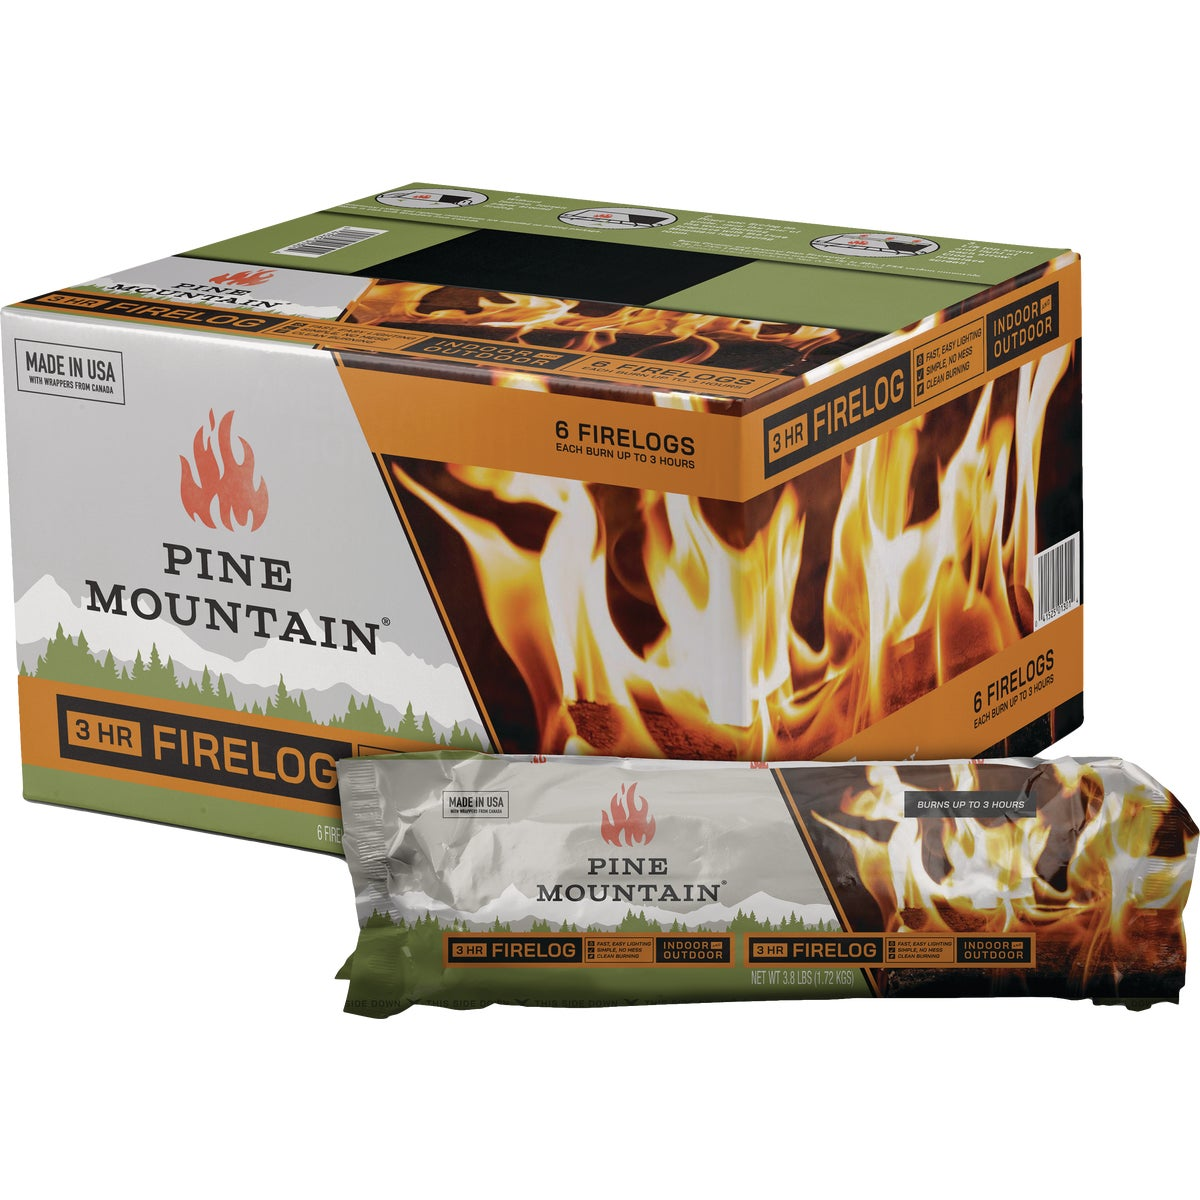 Pine Mountain 3 HOUR FIRE LOG 4152501301